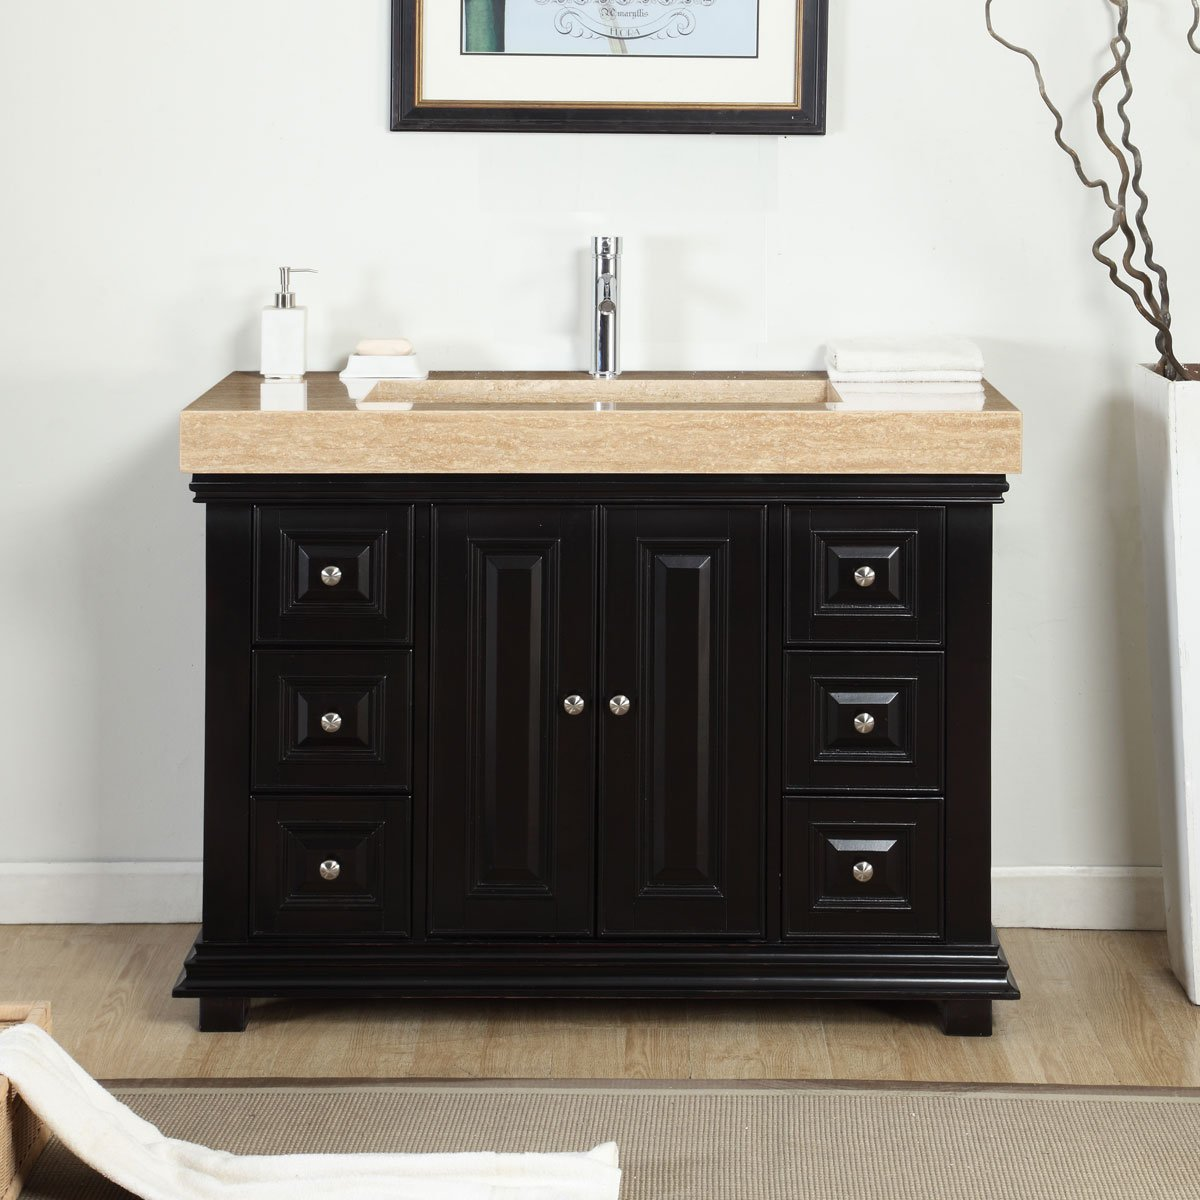 Amazoncom Silkroad Exclusive Bathroom Vanity Travertine Top